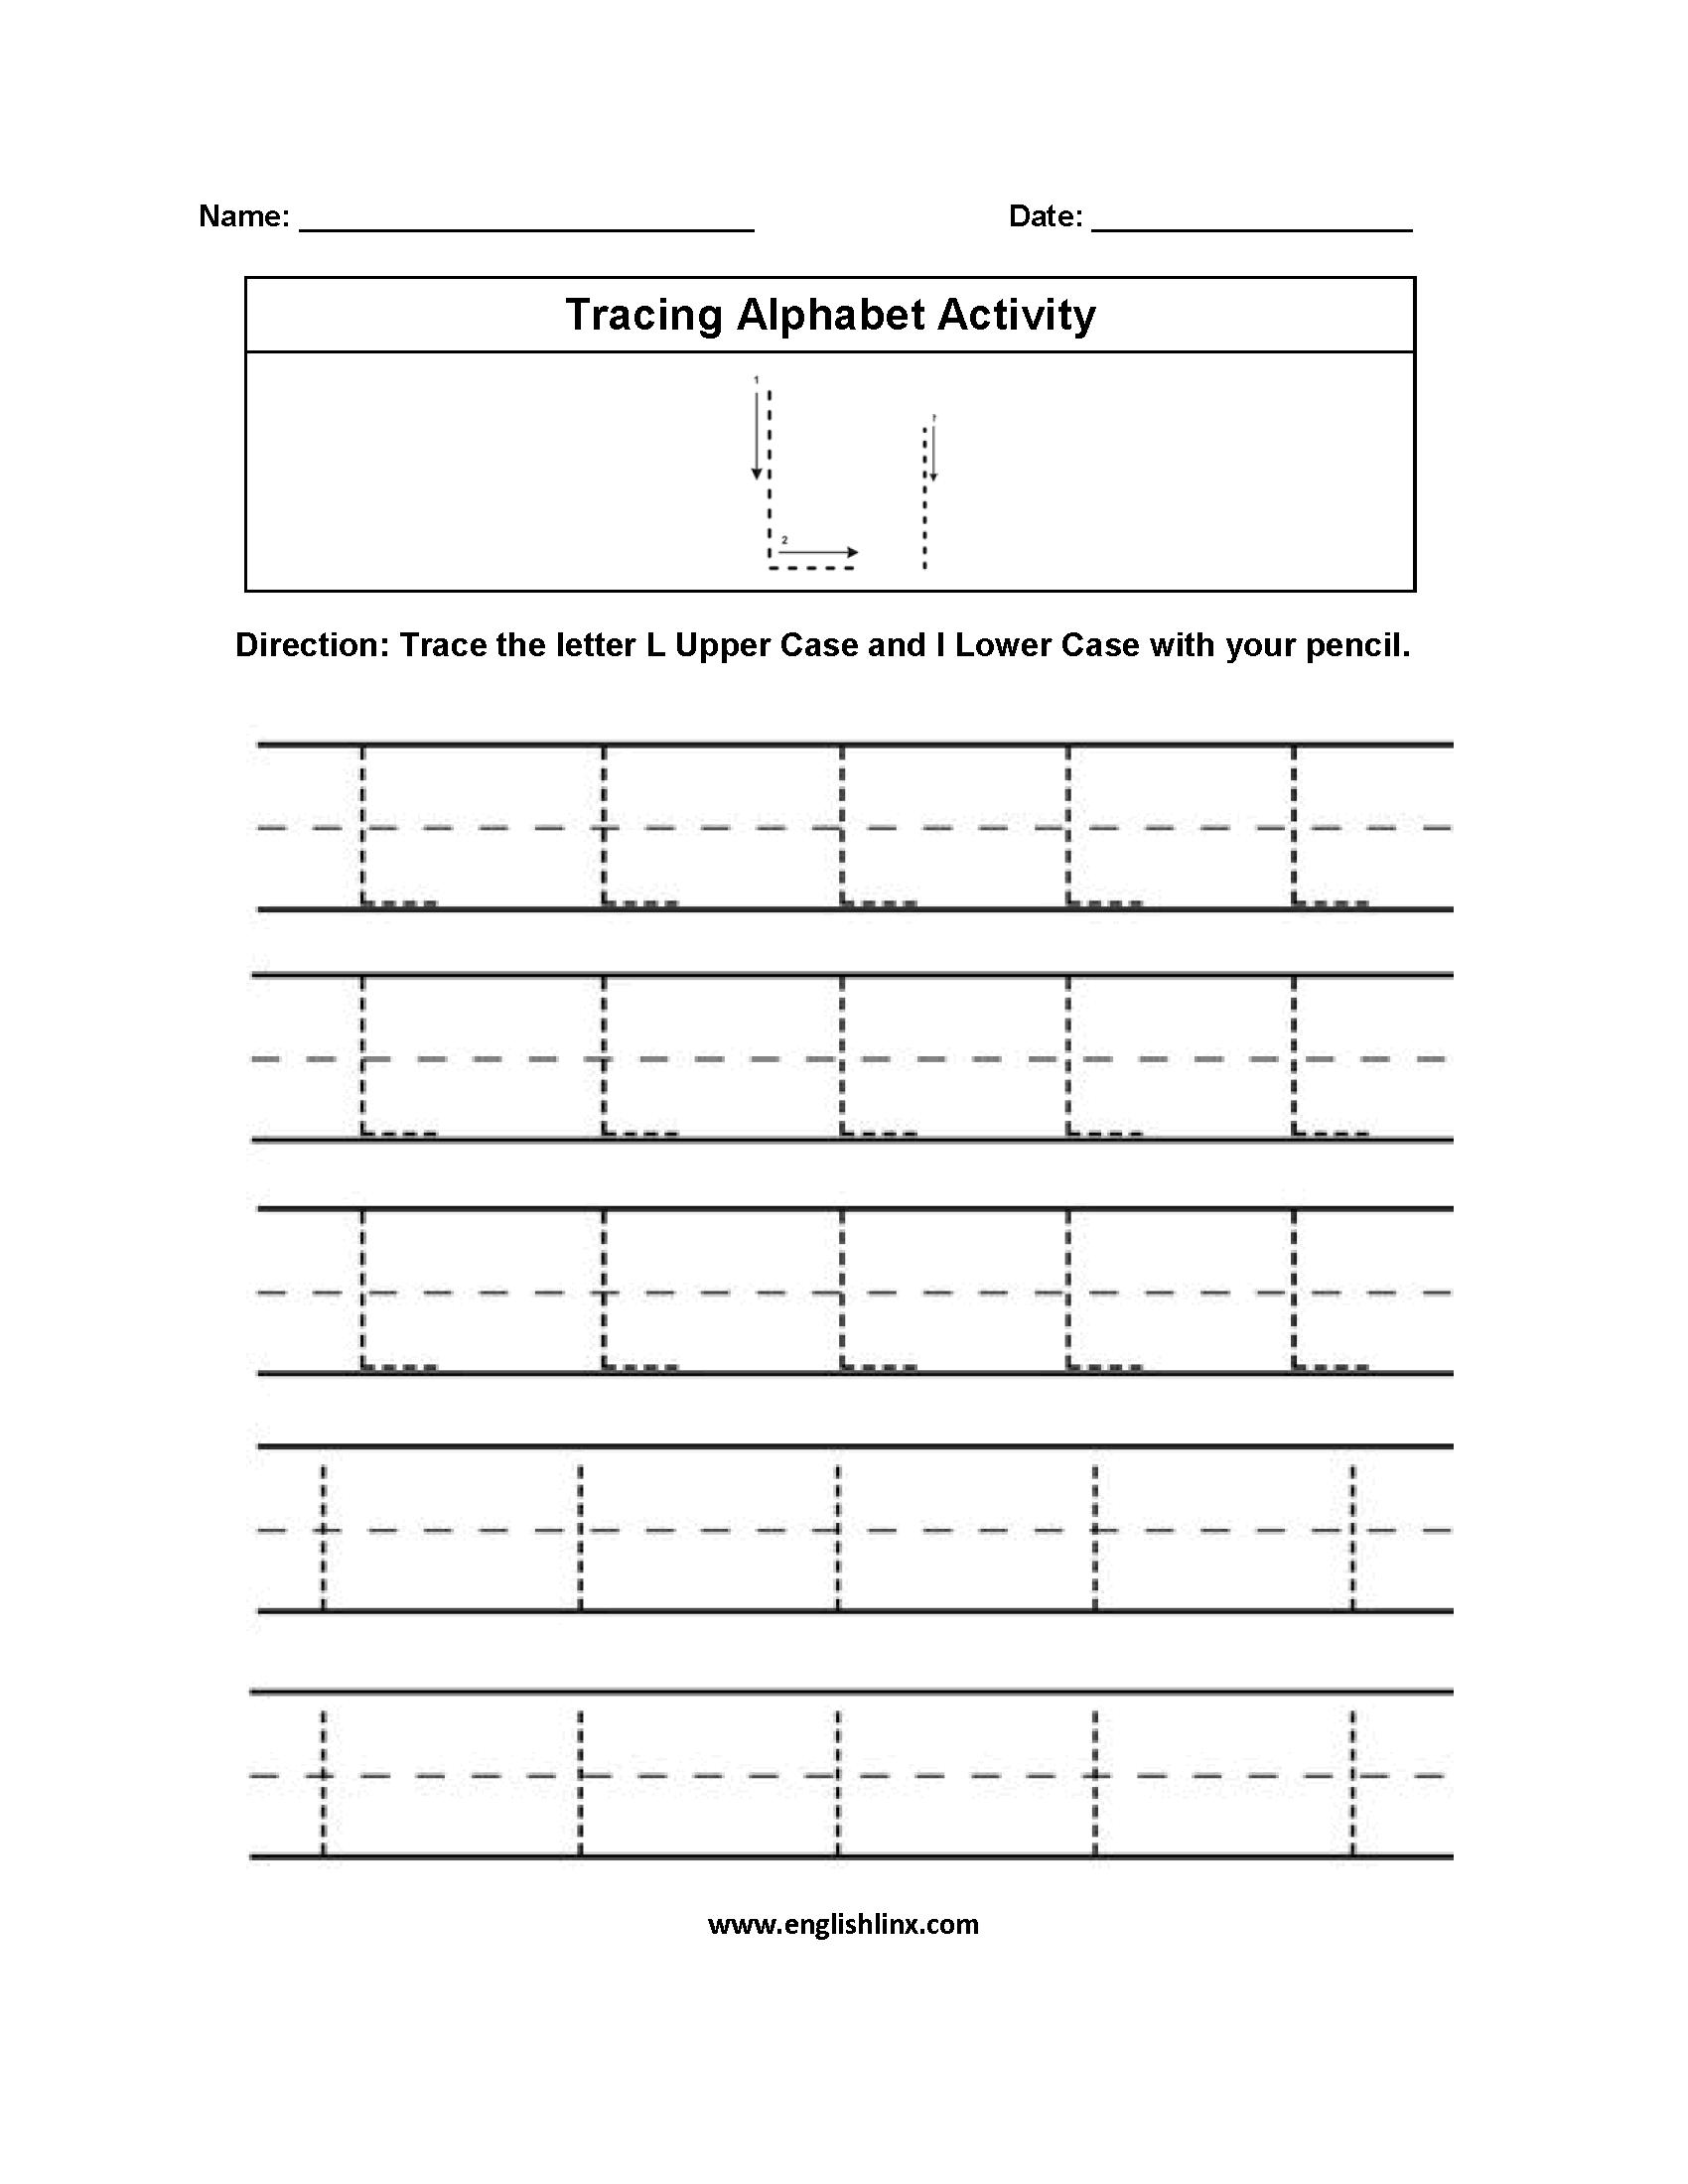 Letter L Tracing Alphabet Worksheets Alphabet Worksheets Preschool Preschool Tracing Alphabet Worksheets [ 2200 x 1700 Pixel ]